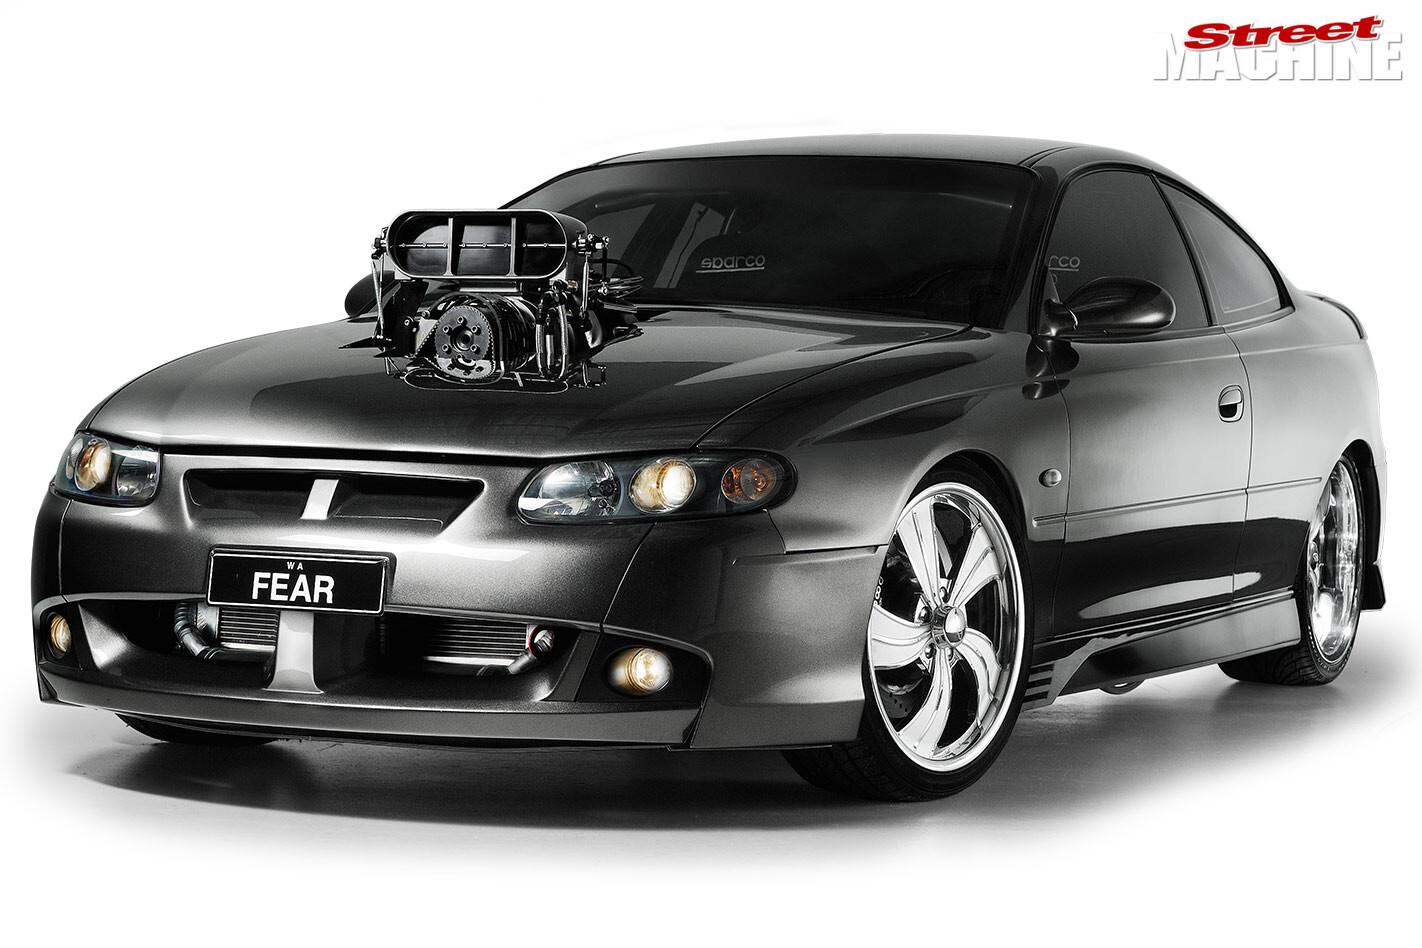 HSV GTO front